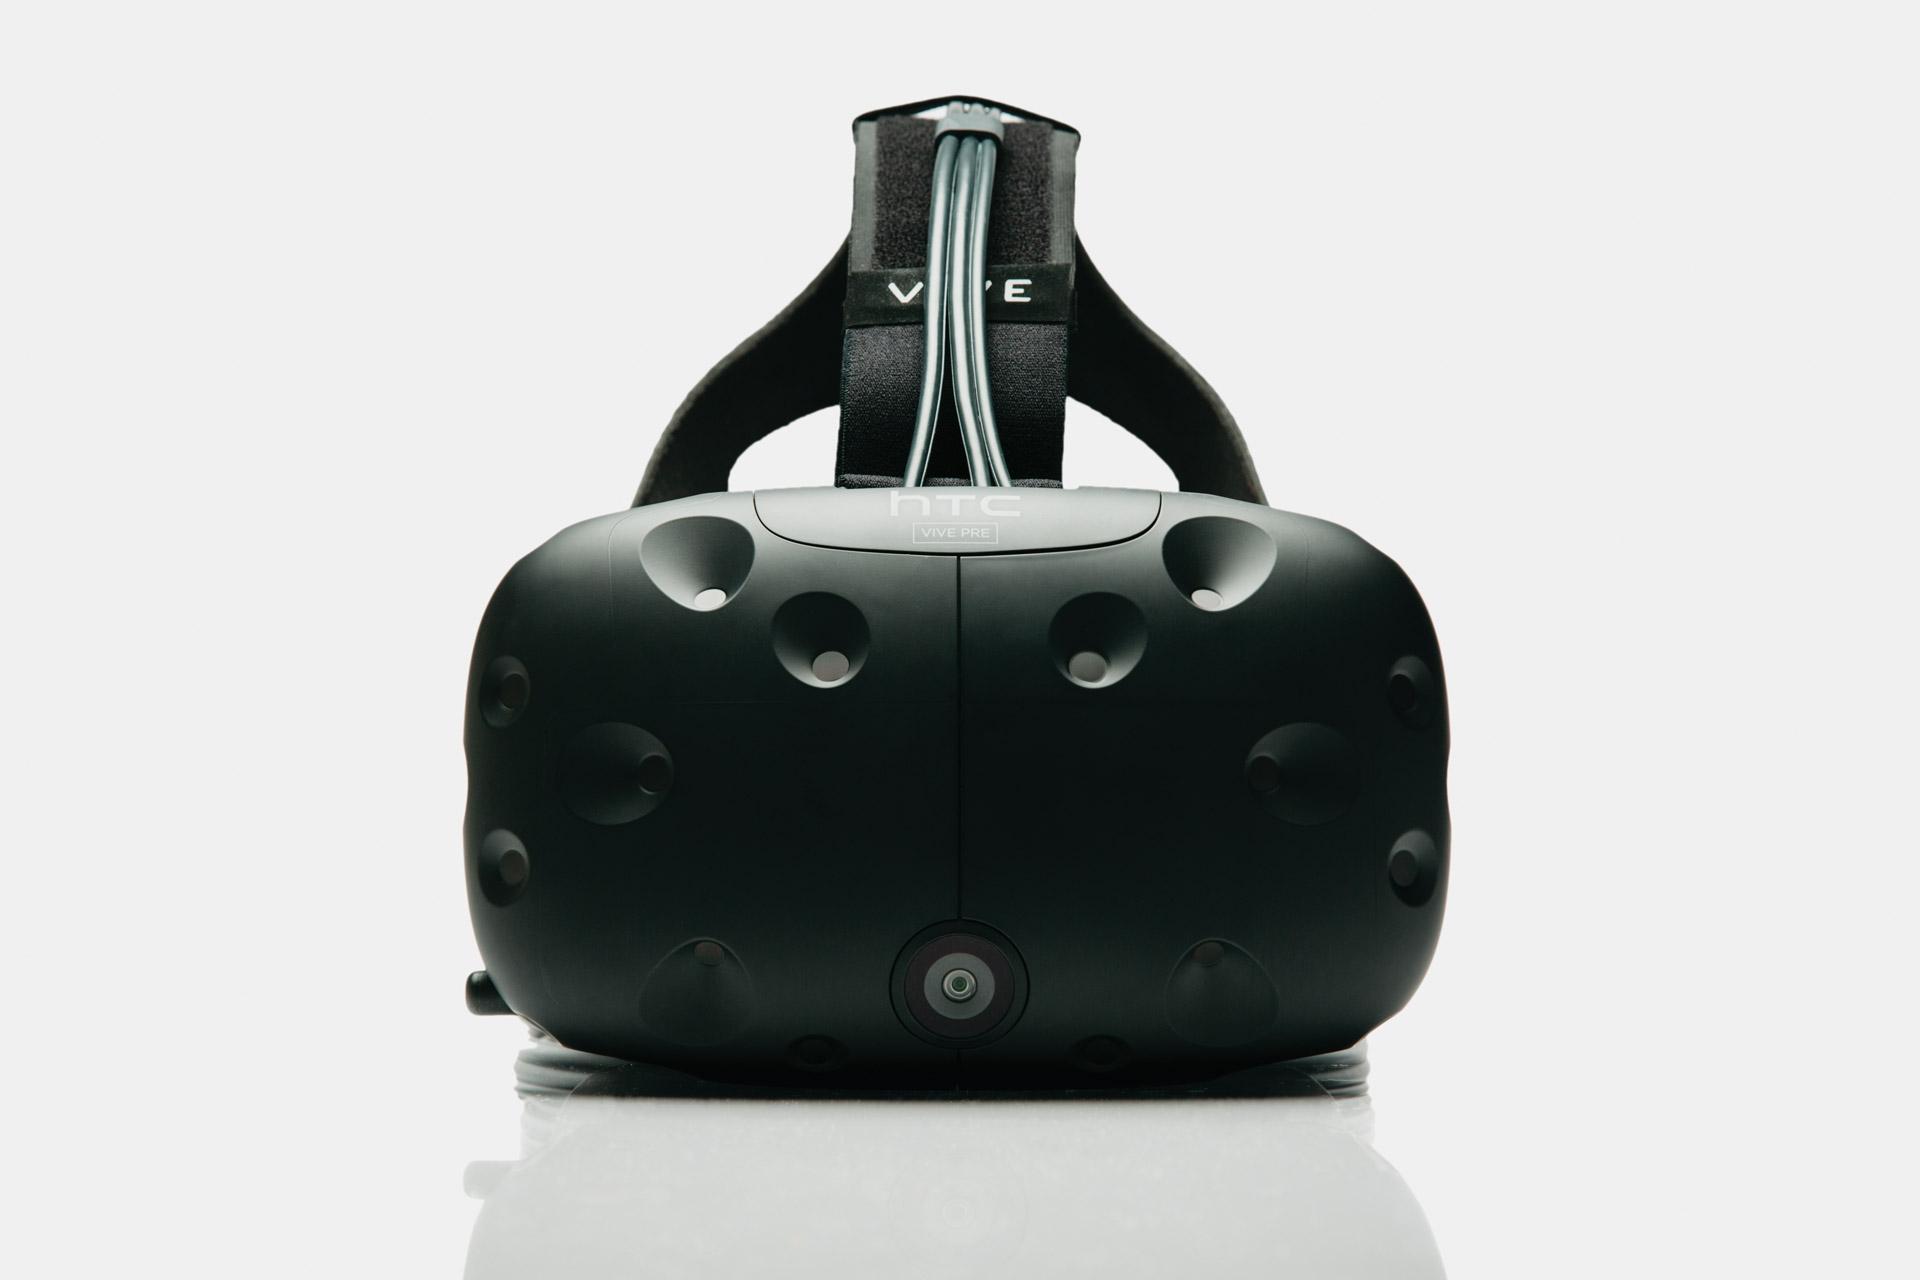 htc-vive-pre-headset.jpg